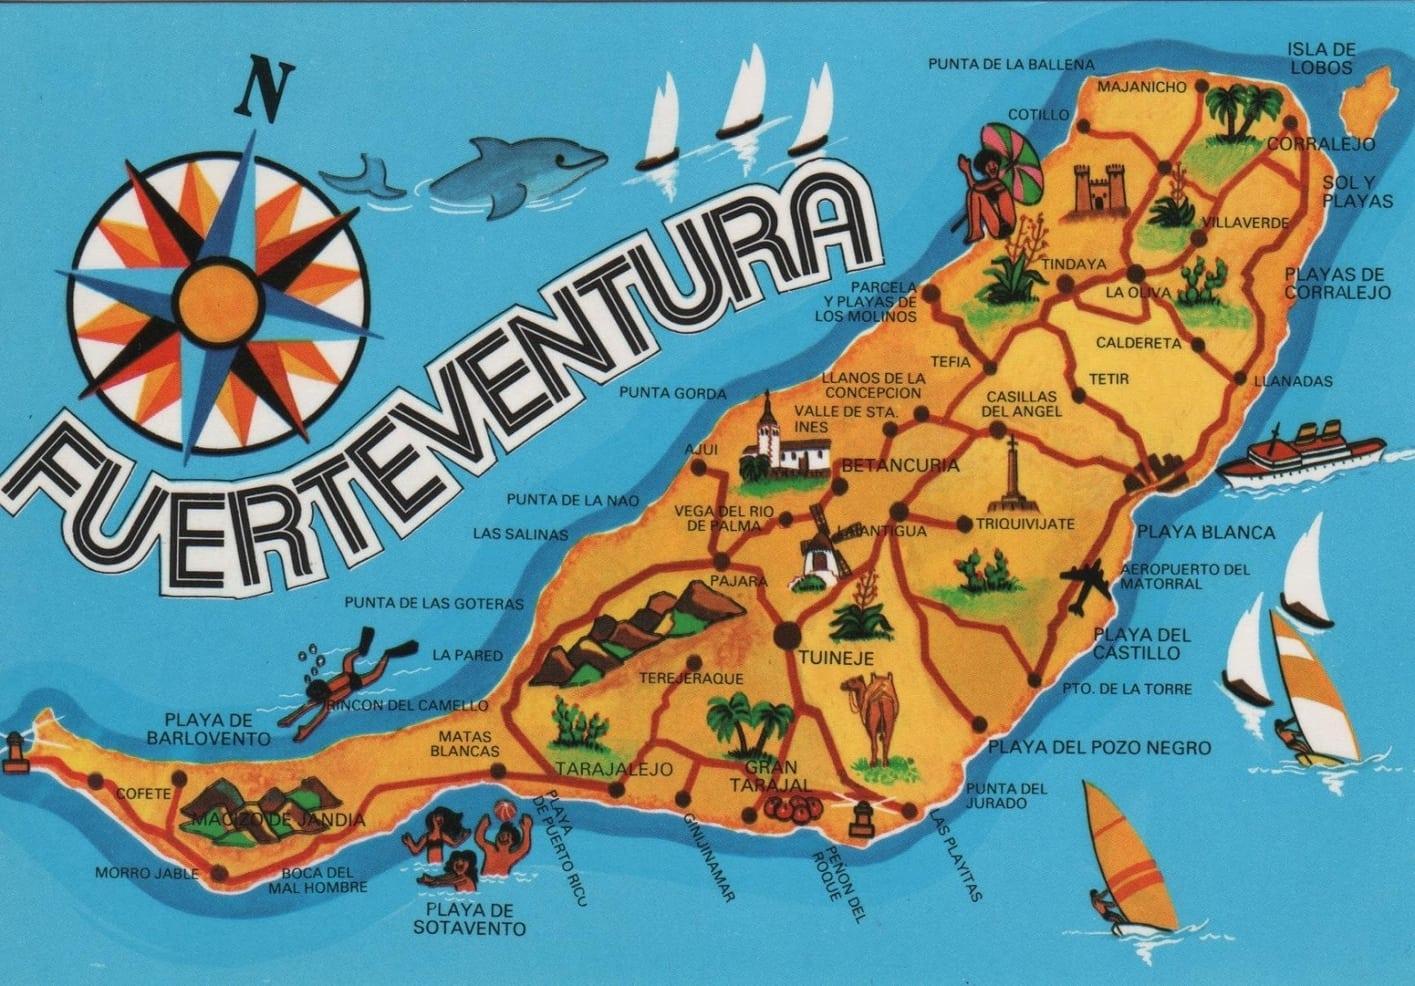 fuerteventura canary islands map spain